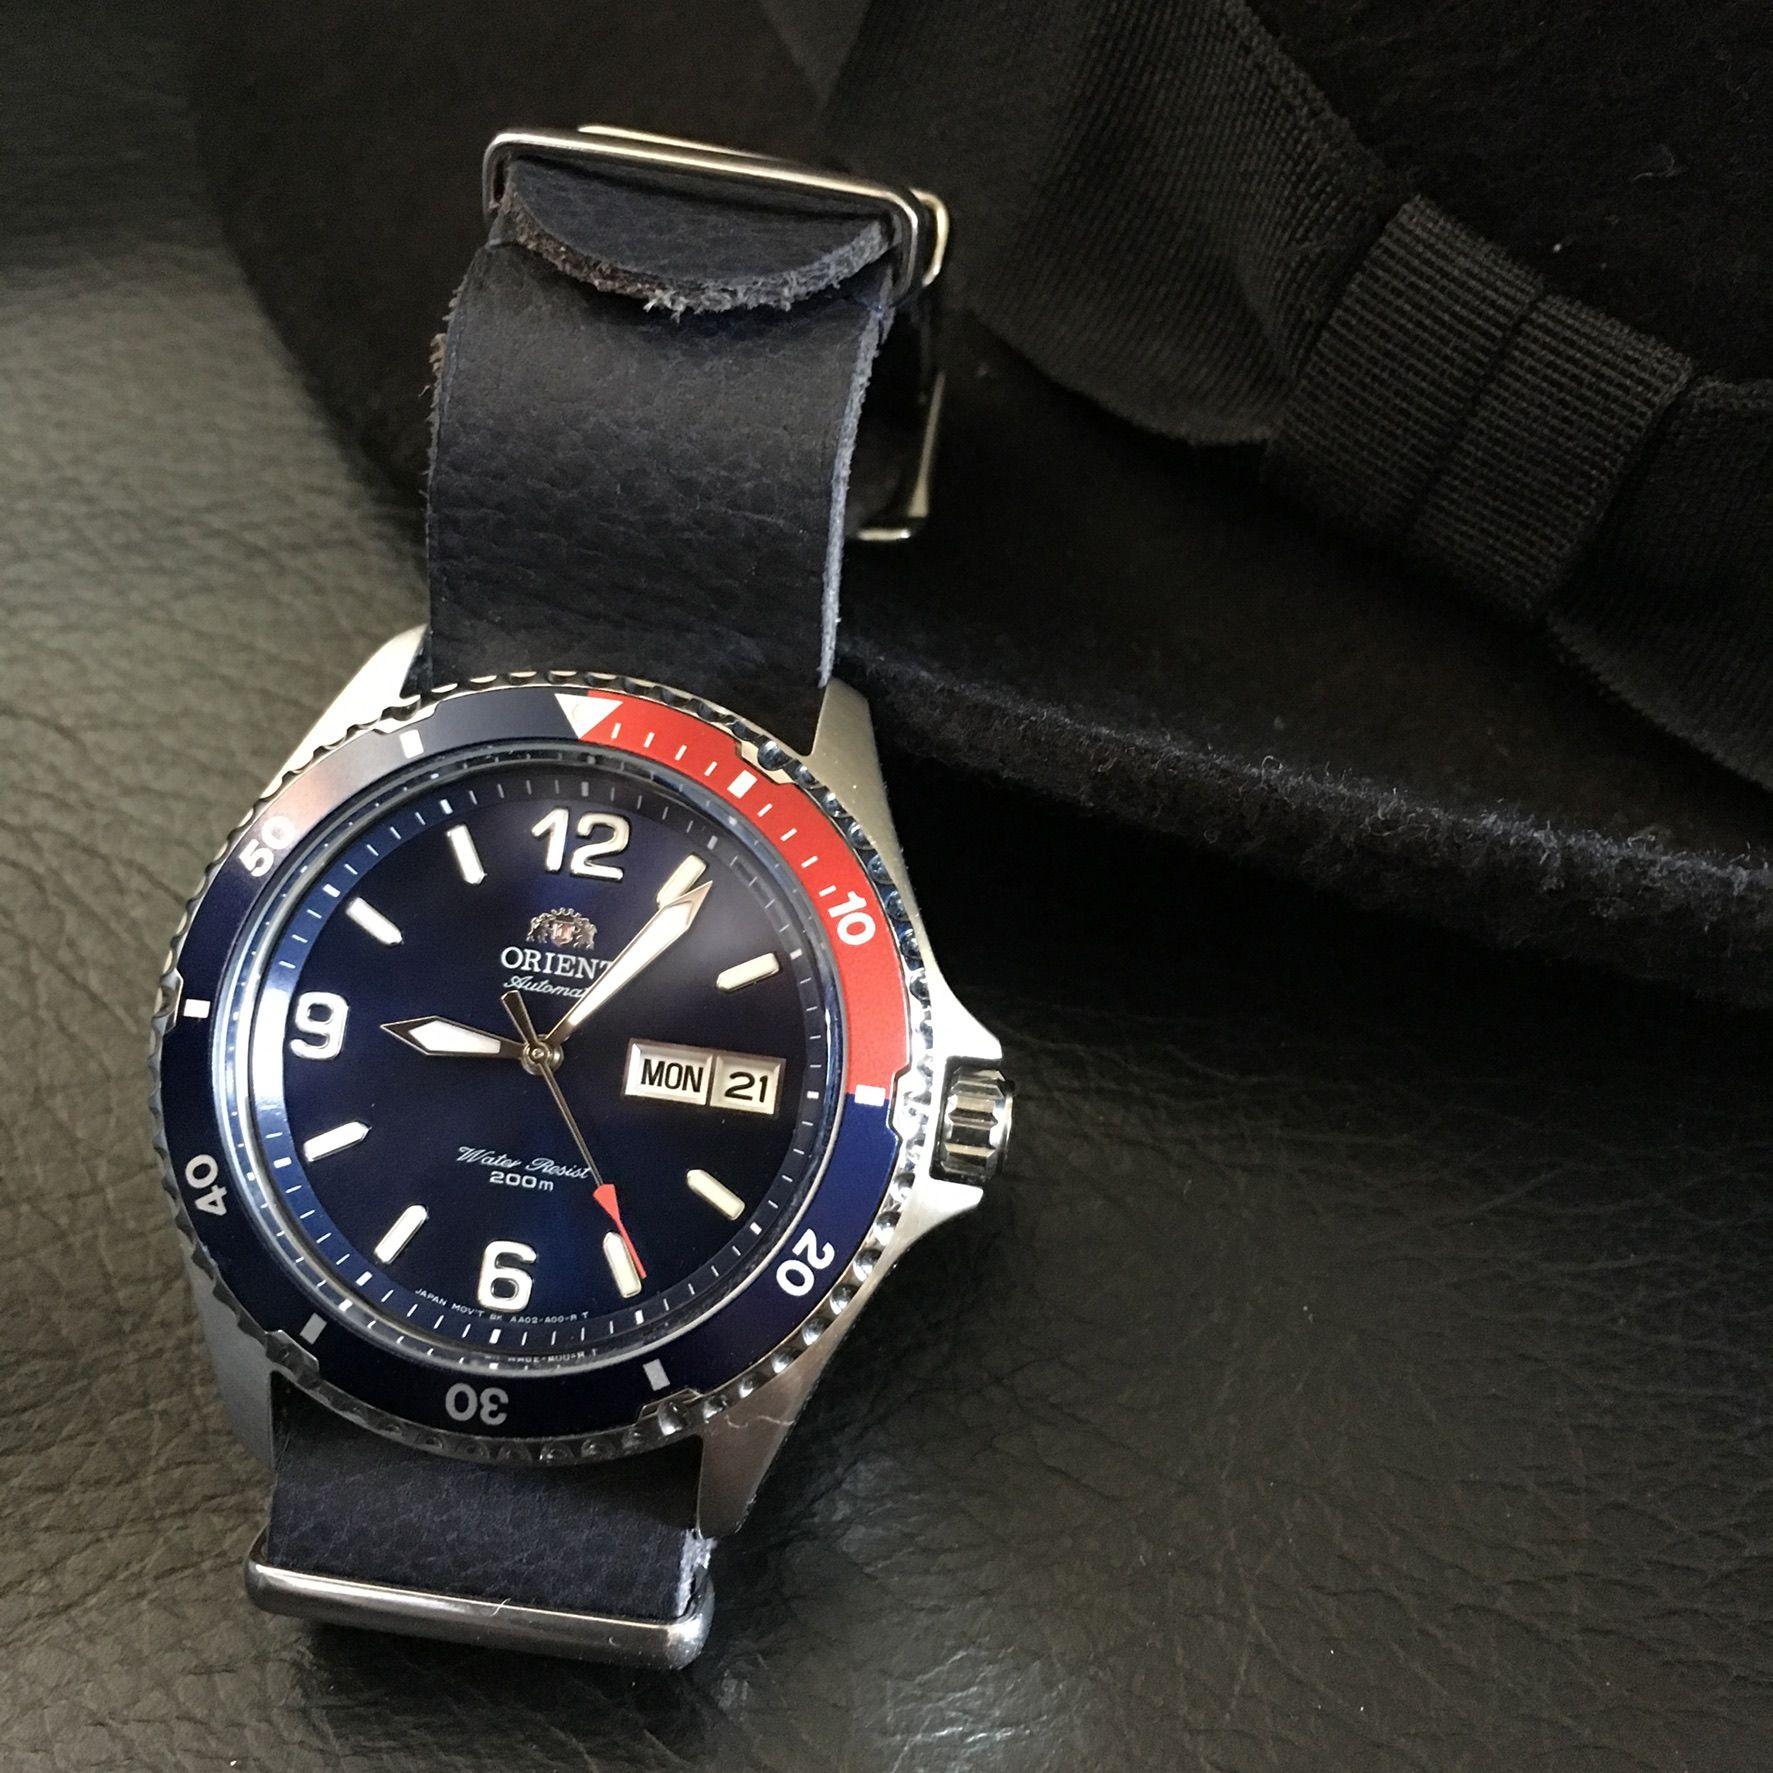 Orient Mako II, Pepsi bezel | Watches, Fountain Pens + in 2019